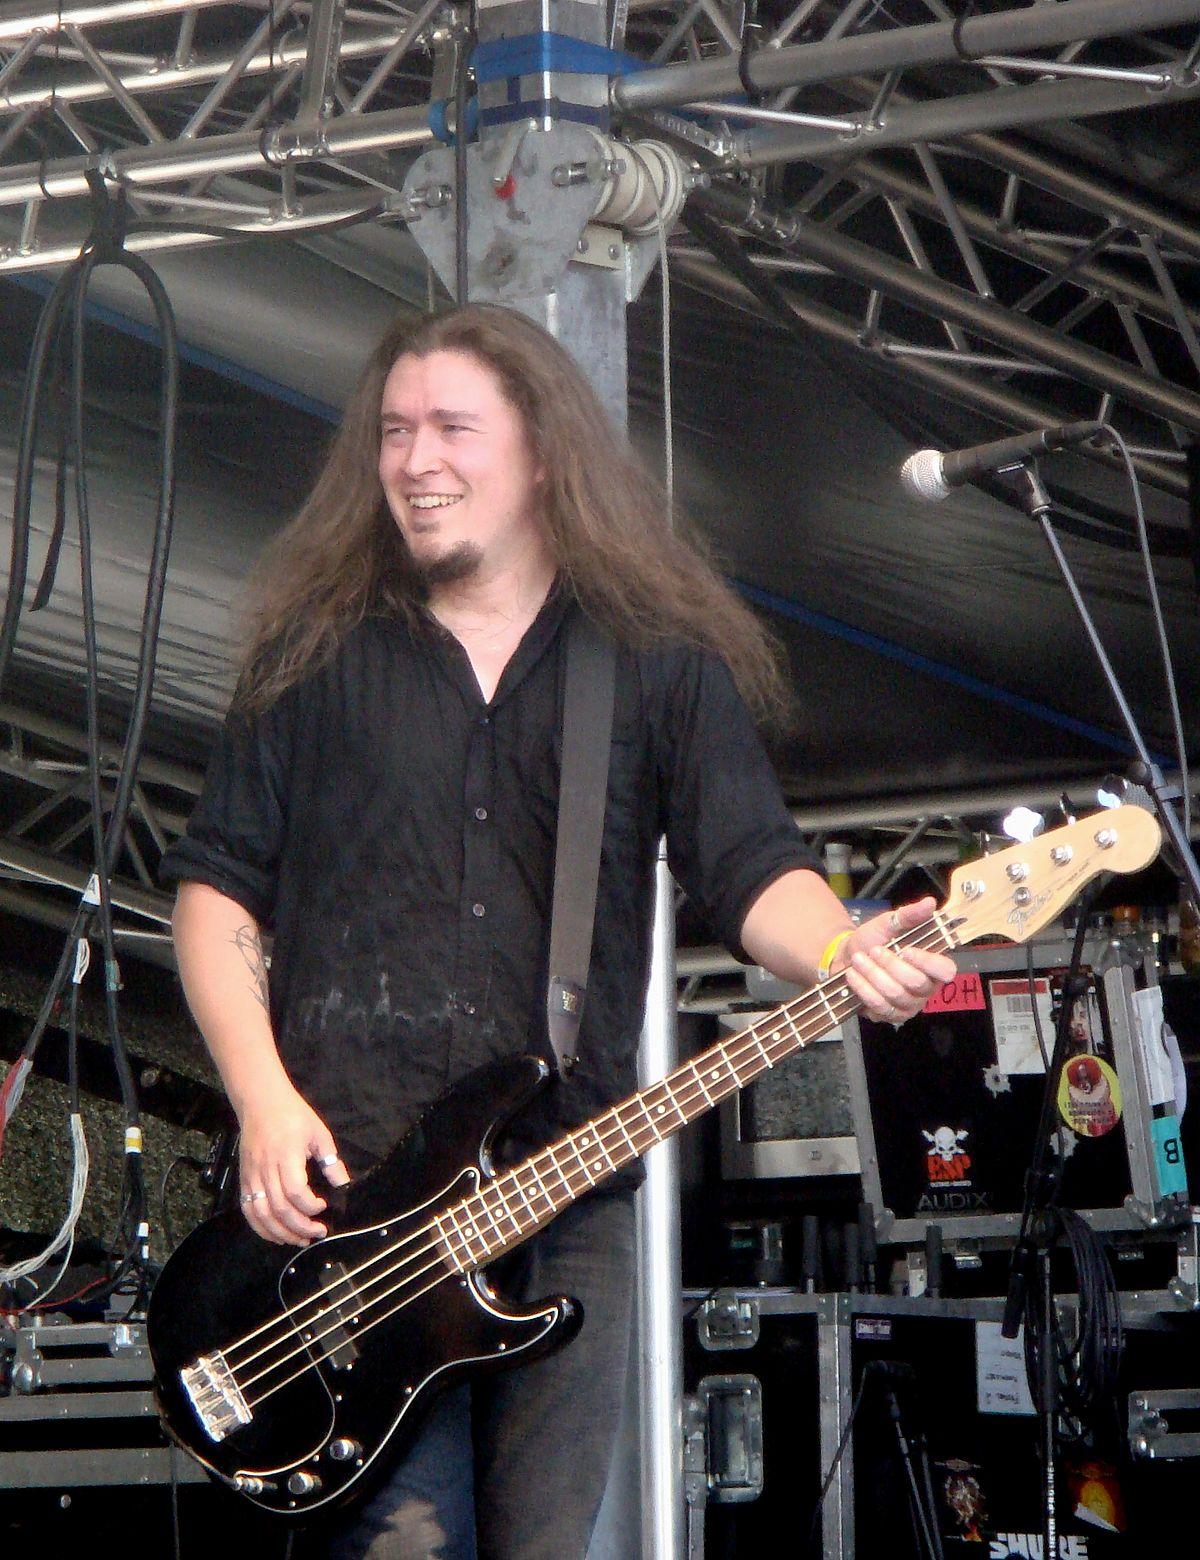 Titus Hjelm